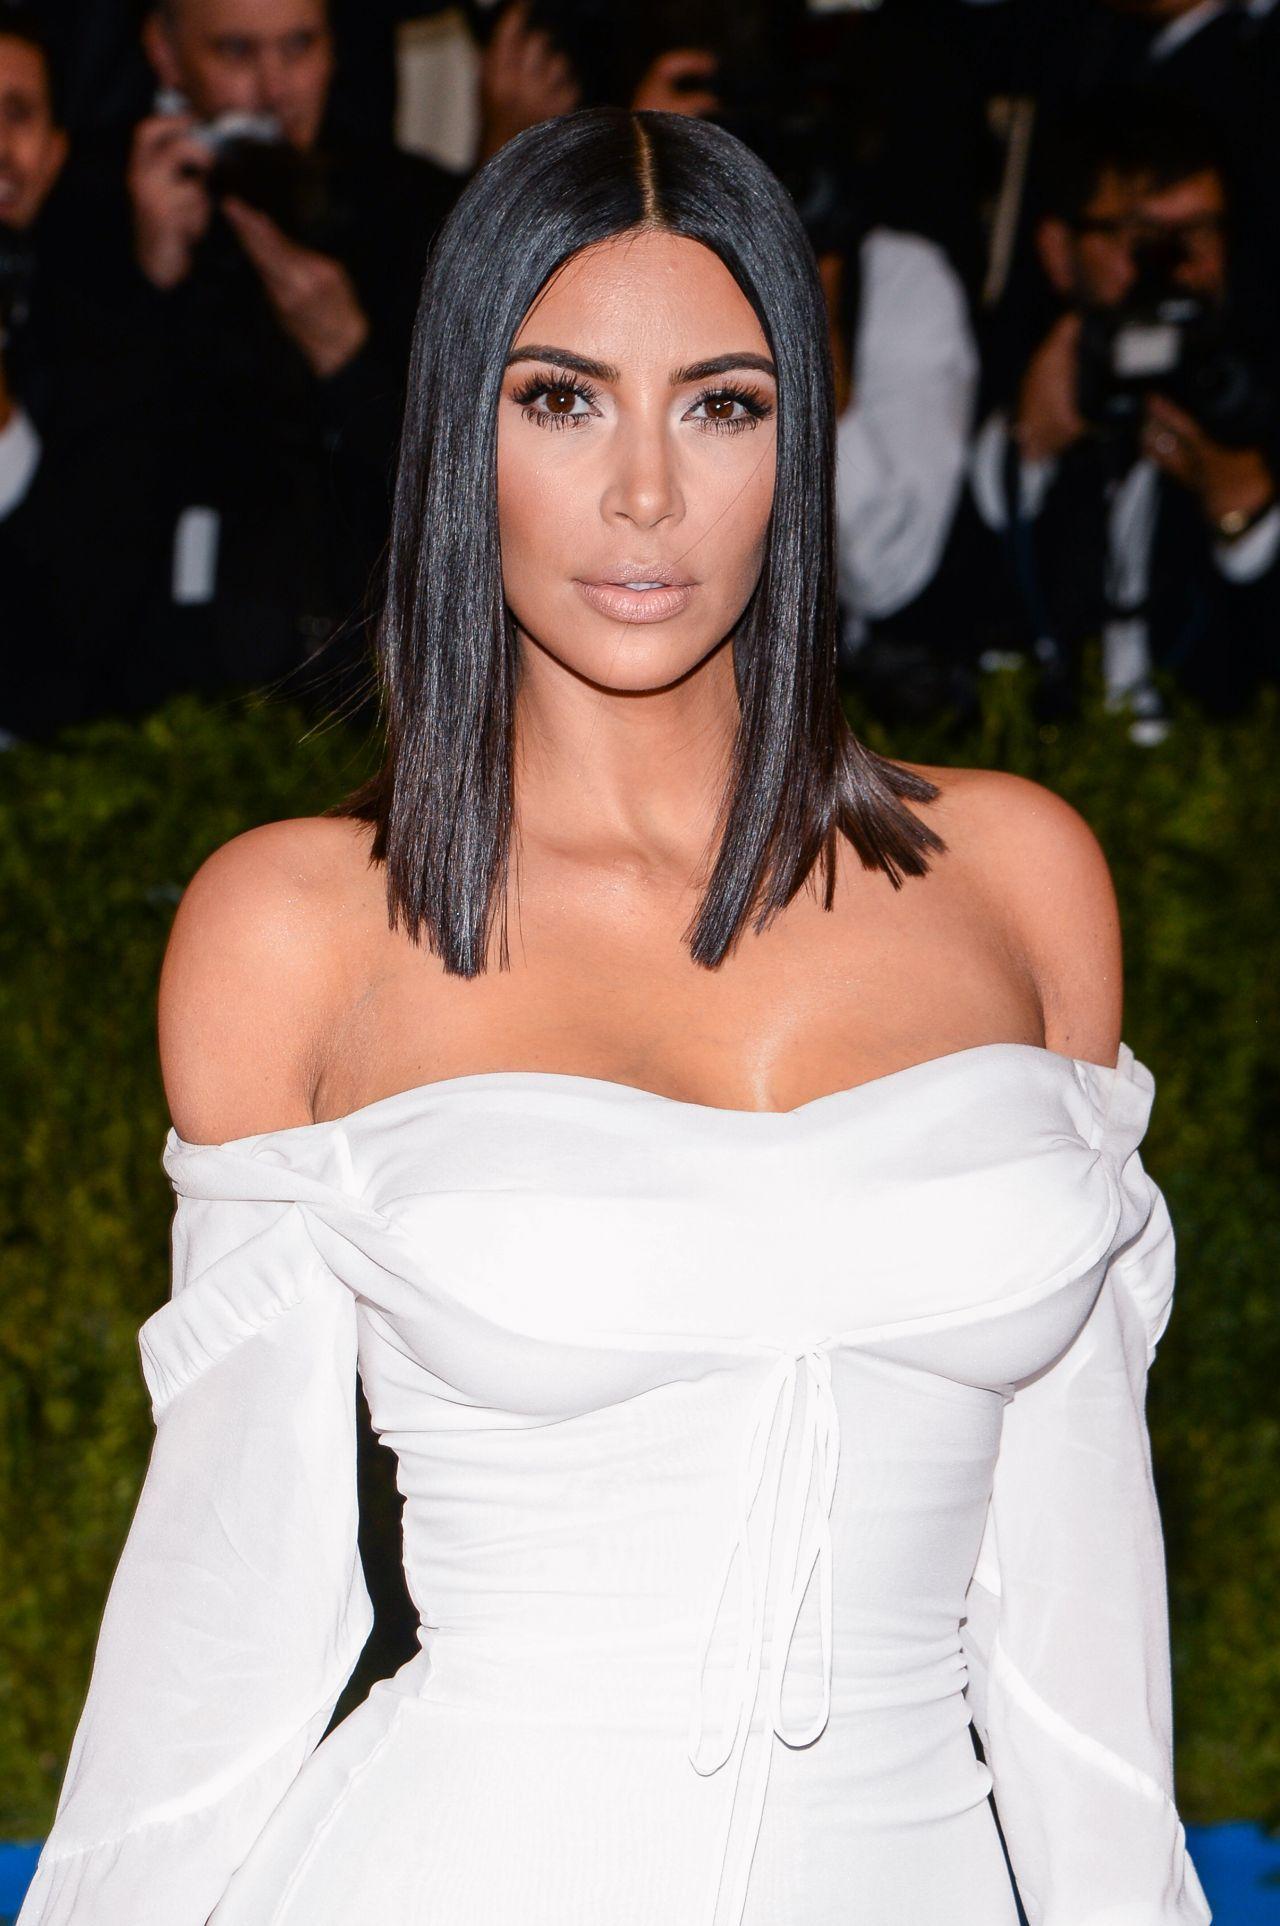 Pin by HVNI BVNI on OH K K KAAAAY! | Kim Kardashian, Kim ...